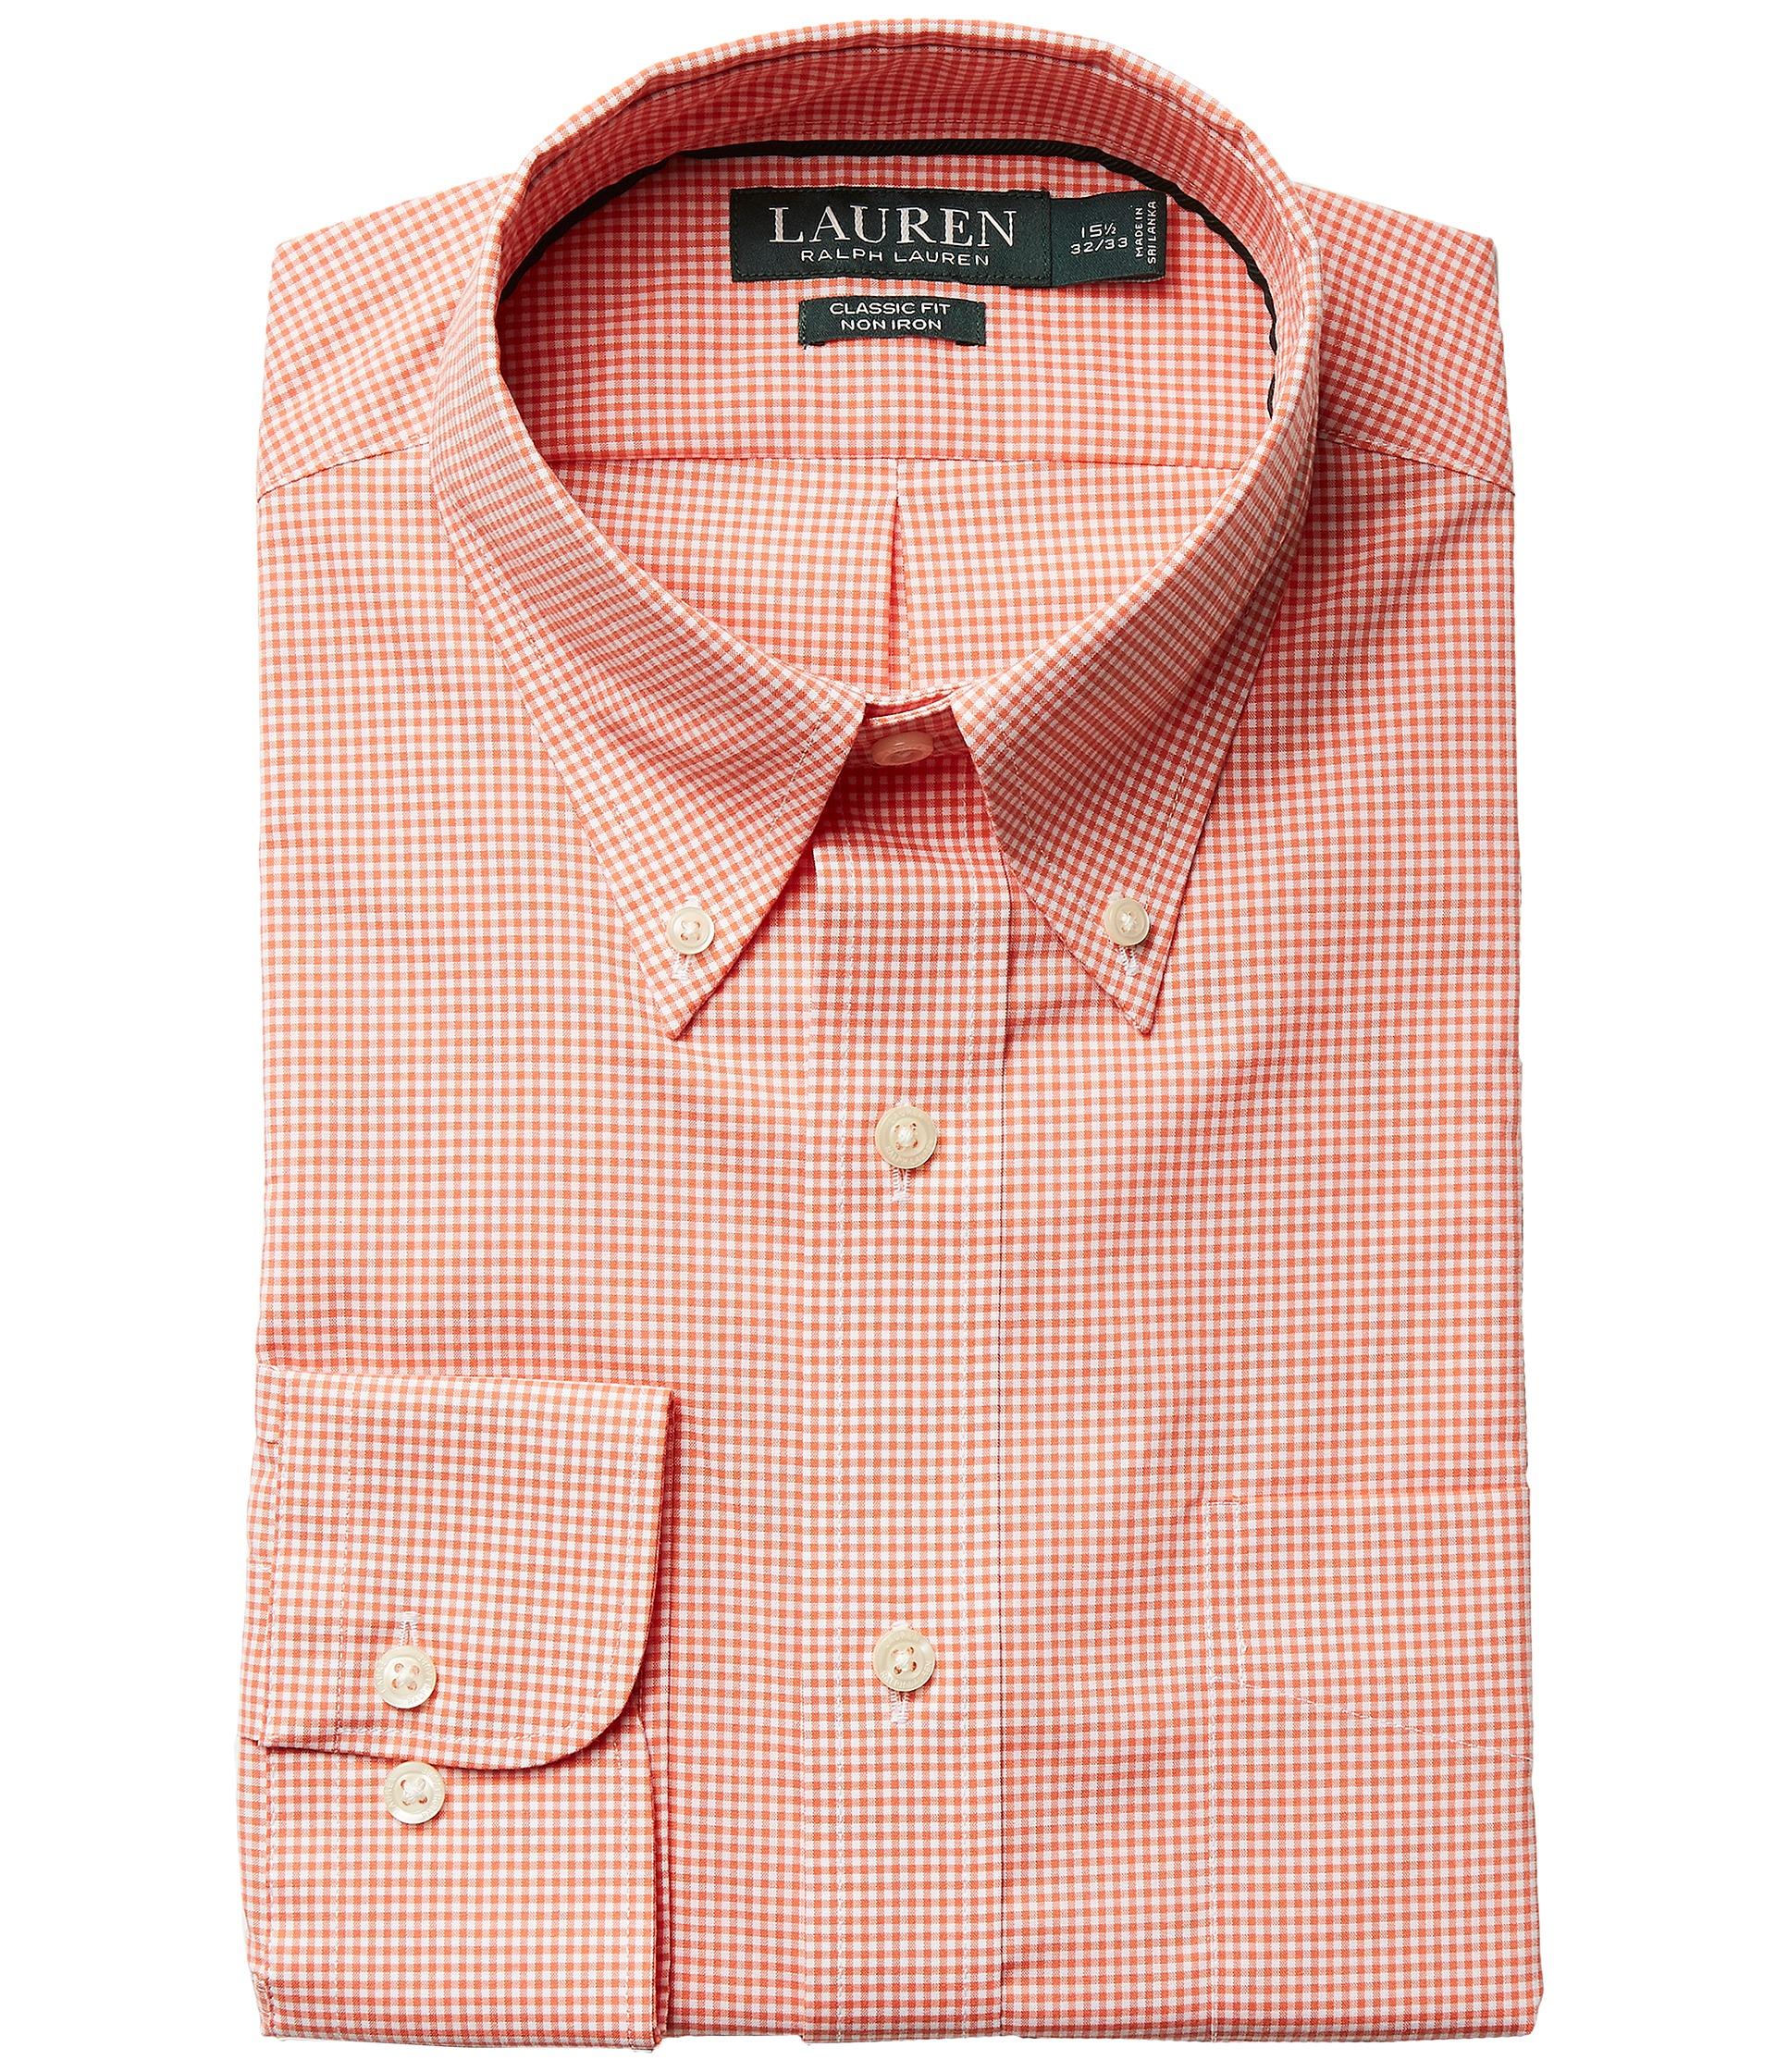 Lauren ralph lauren classic fit non iron gingham plaid for Dress shirt collar fit